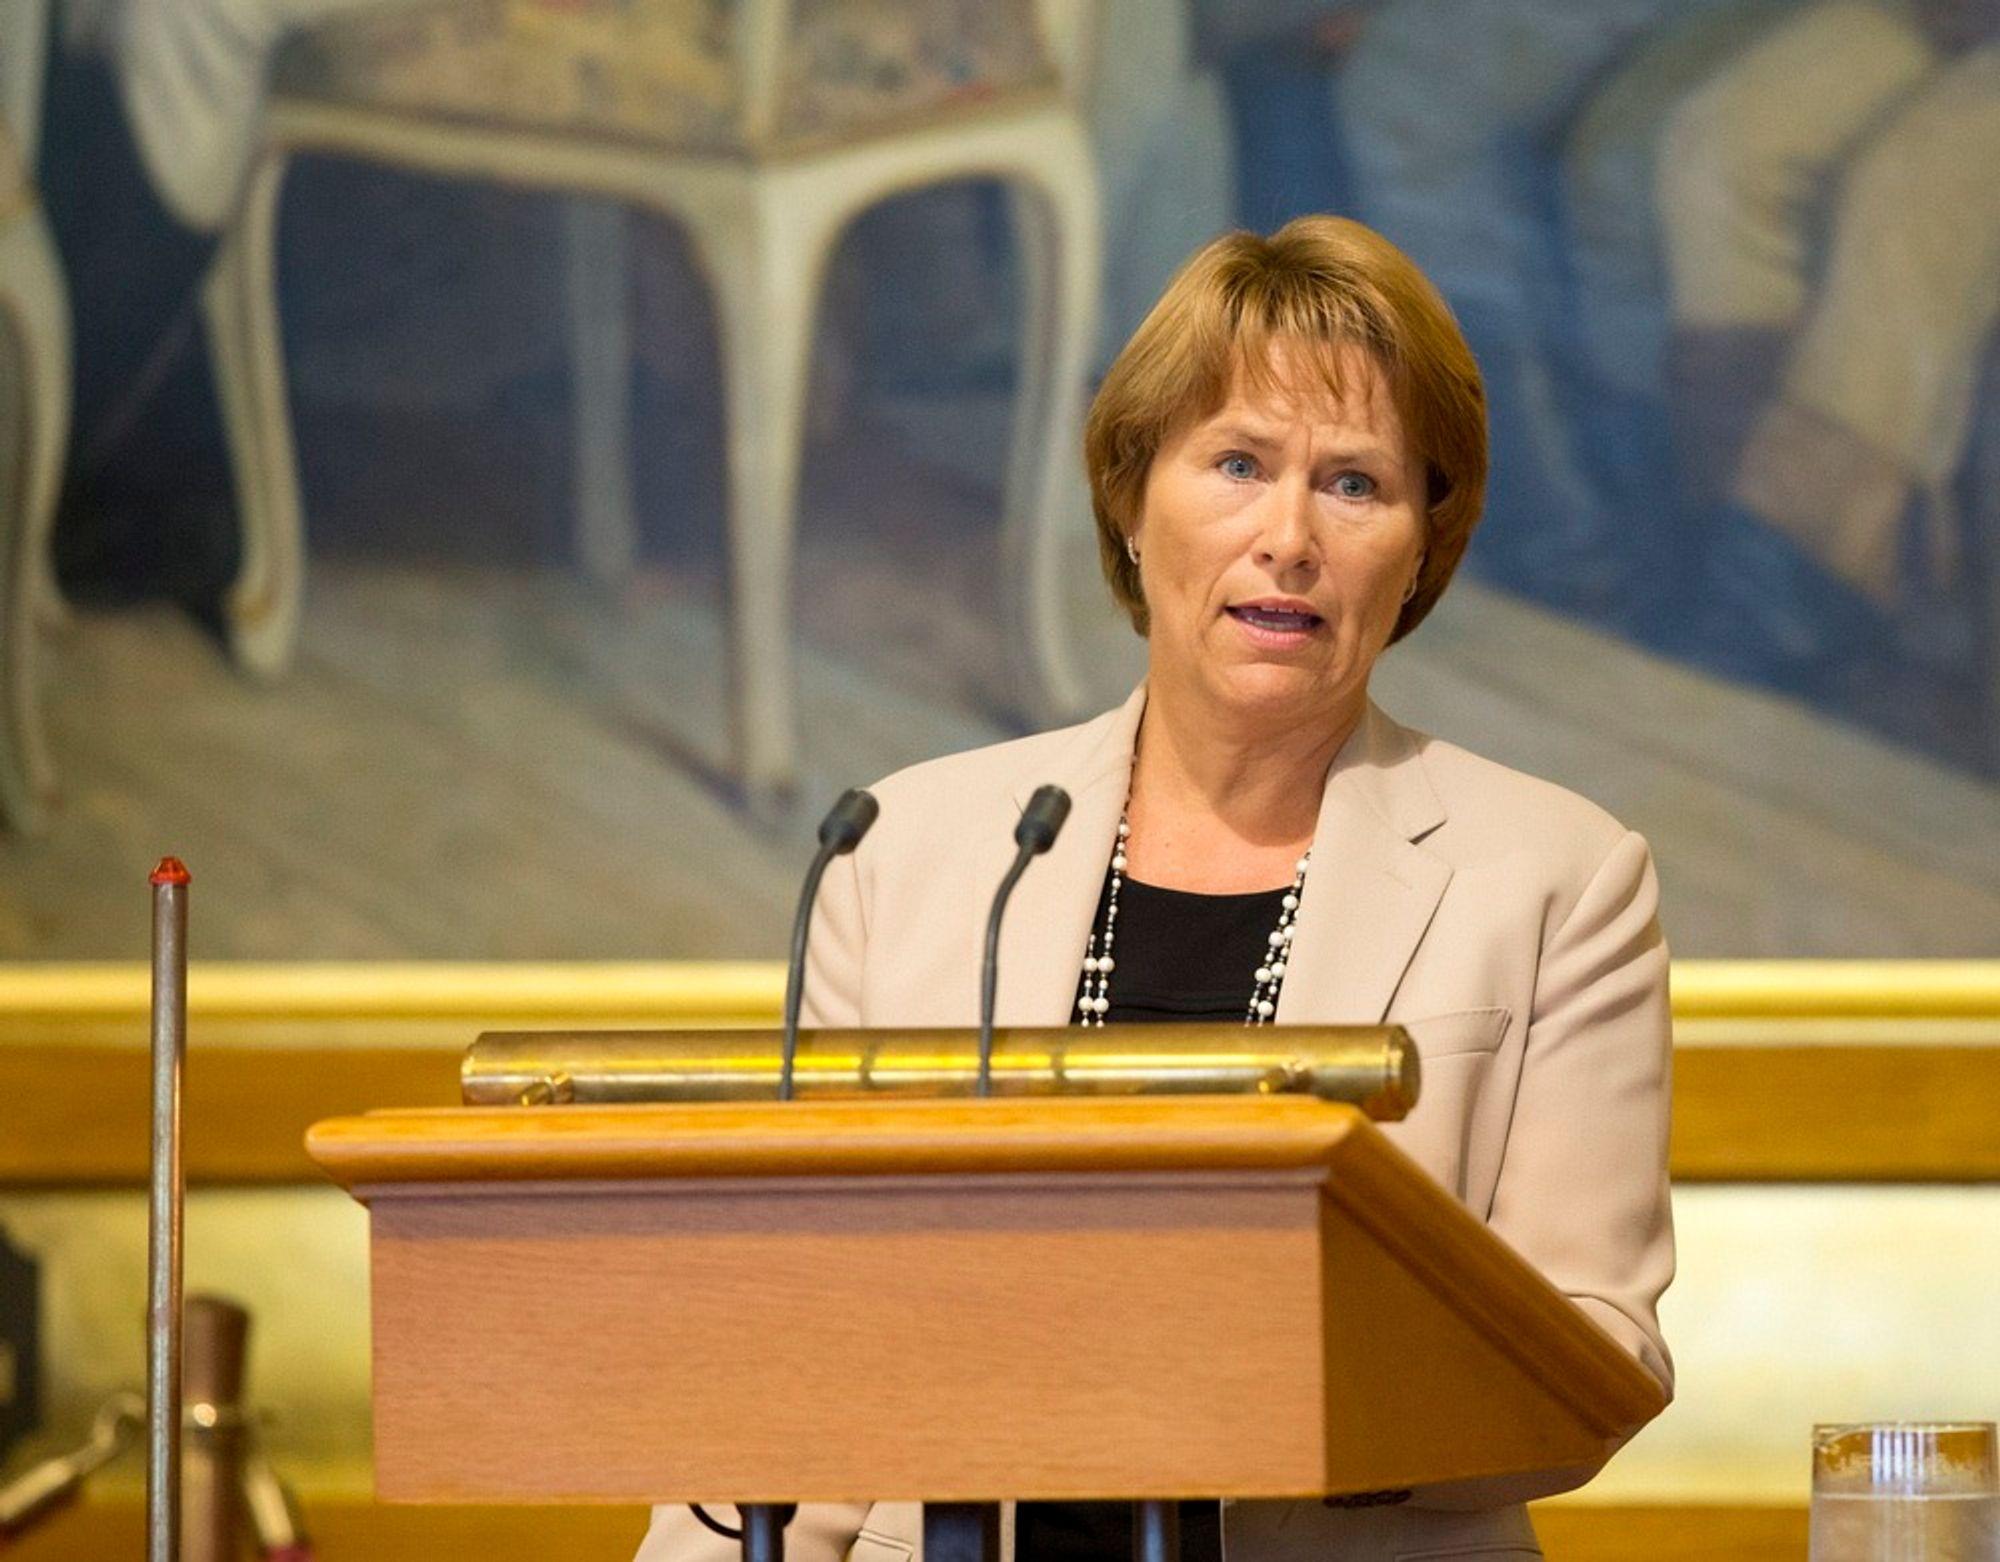 Justisminister Grete Faremo i Stortinget tirsdag under 22. juli redegjørelsen.